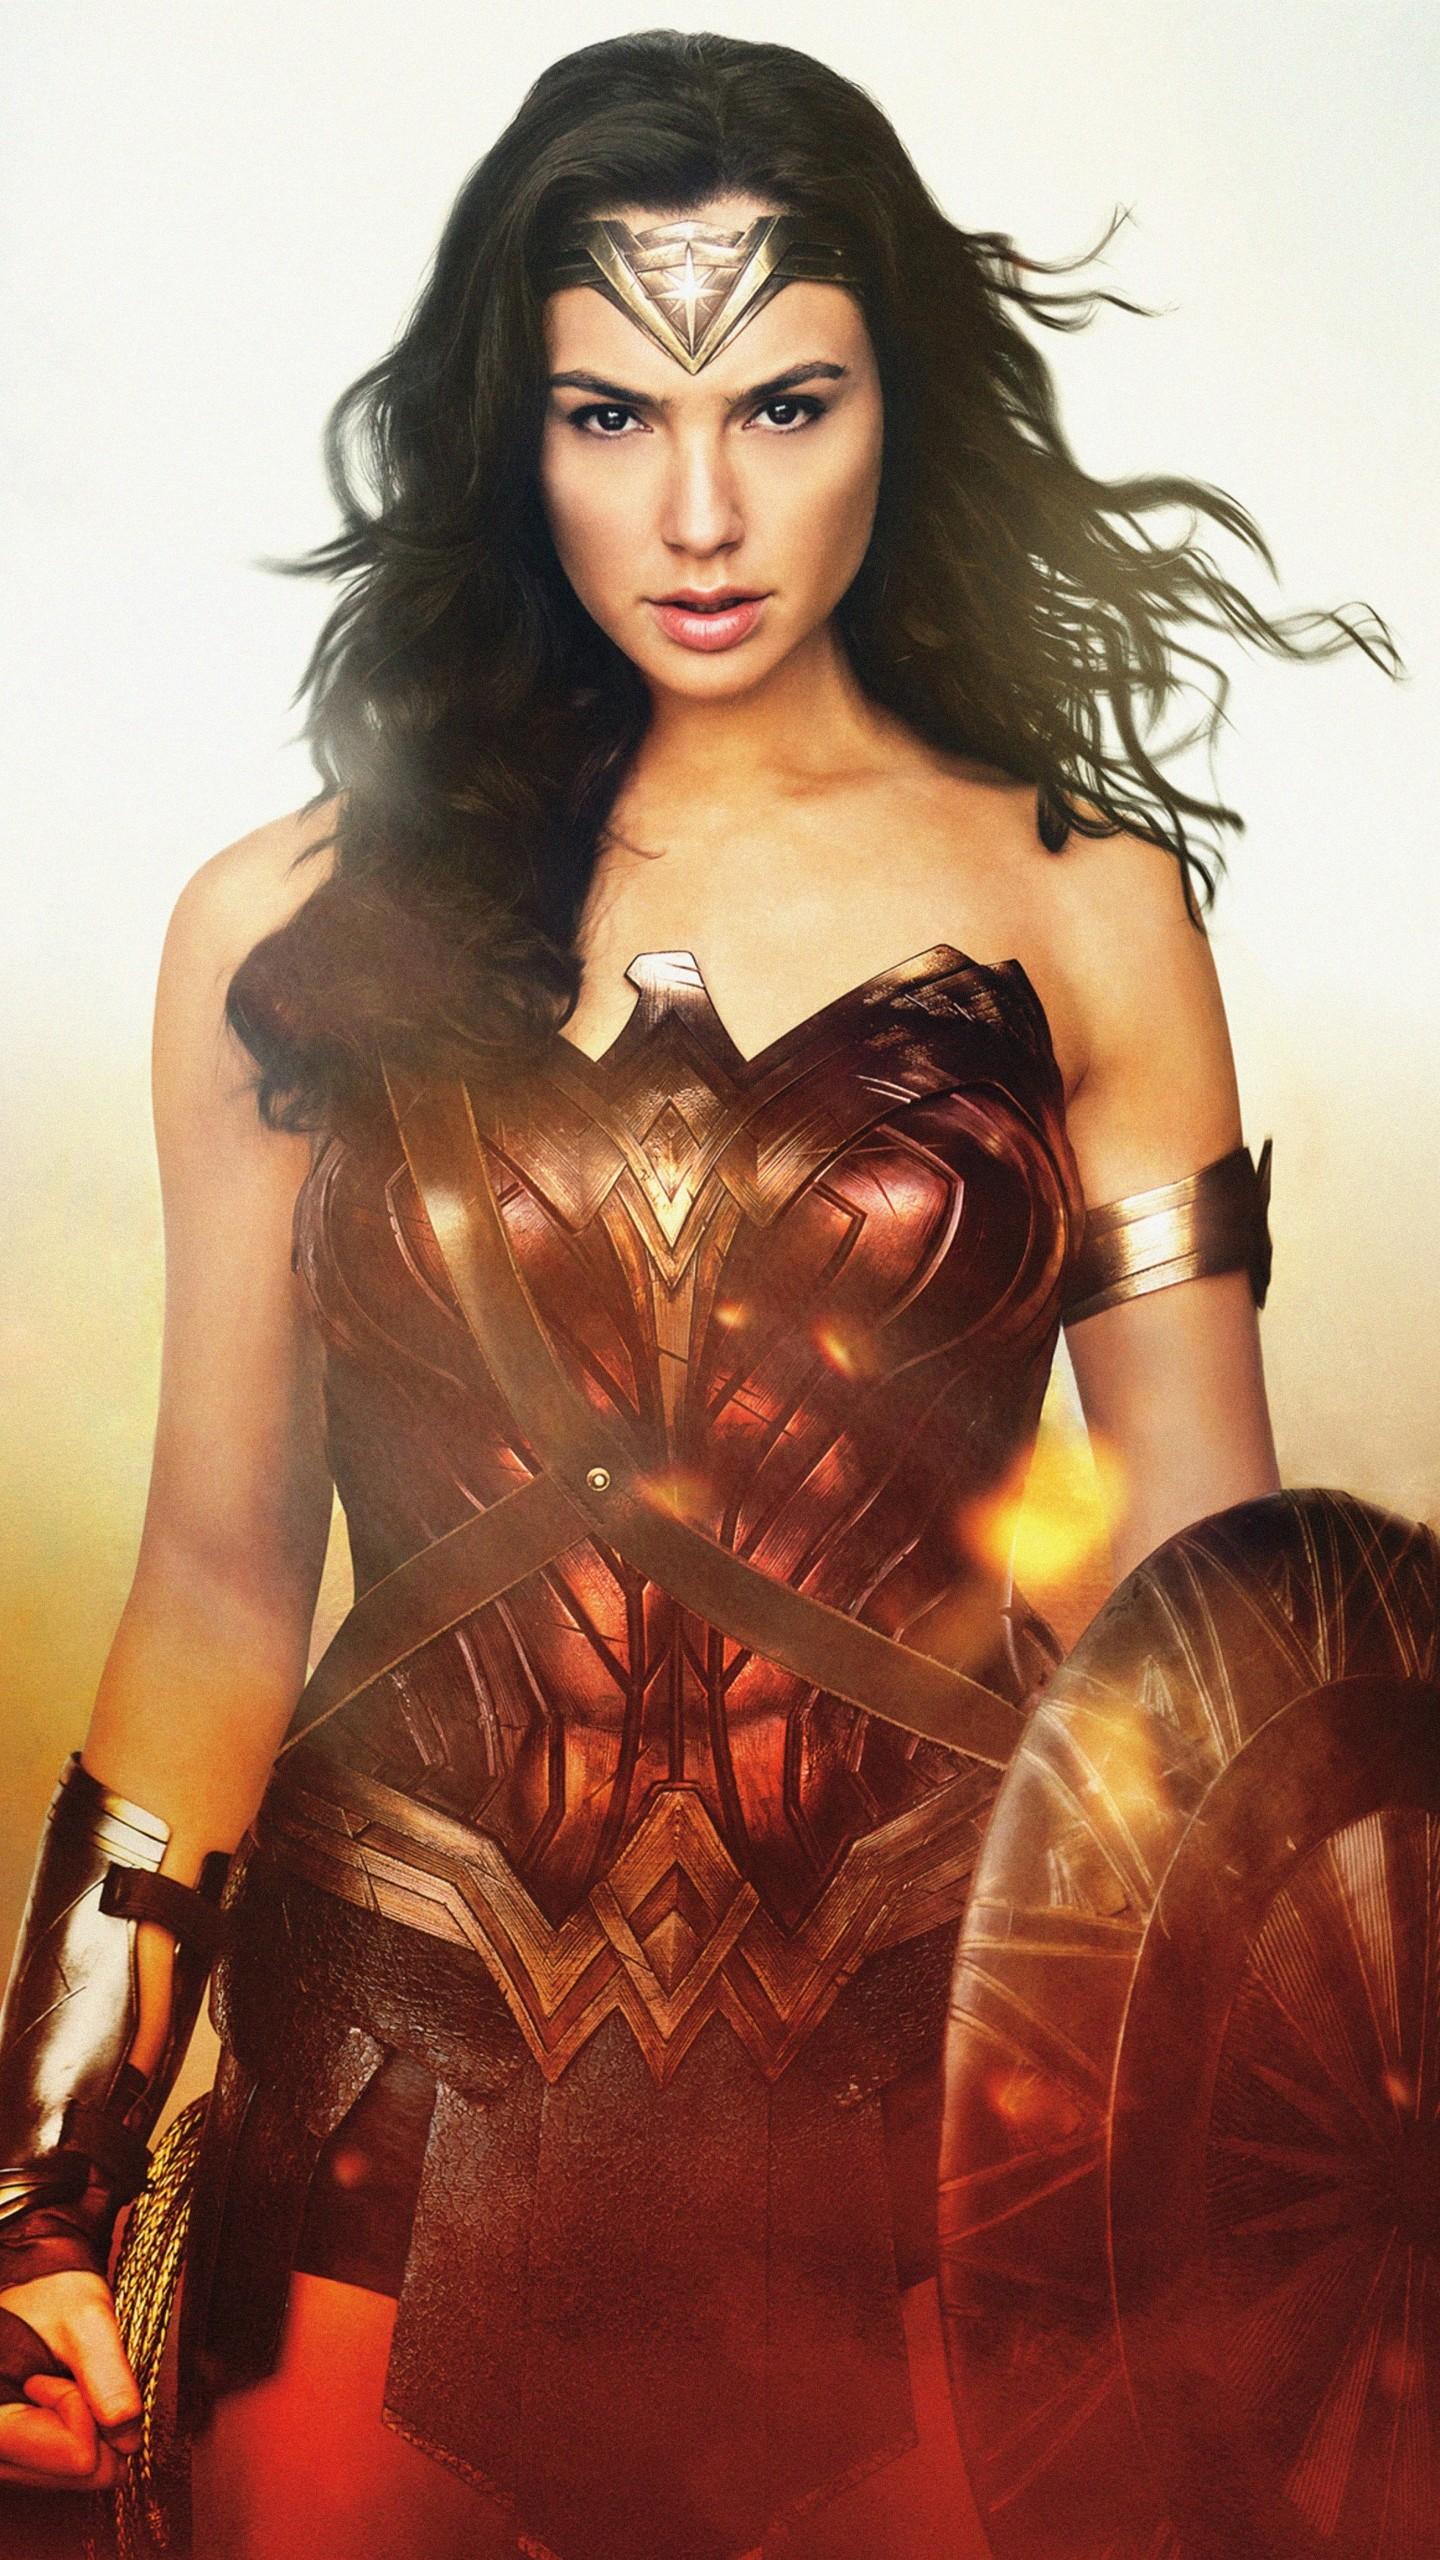 Wonder Woman Wallpaper 71 Images